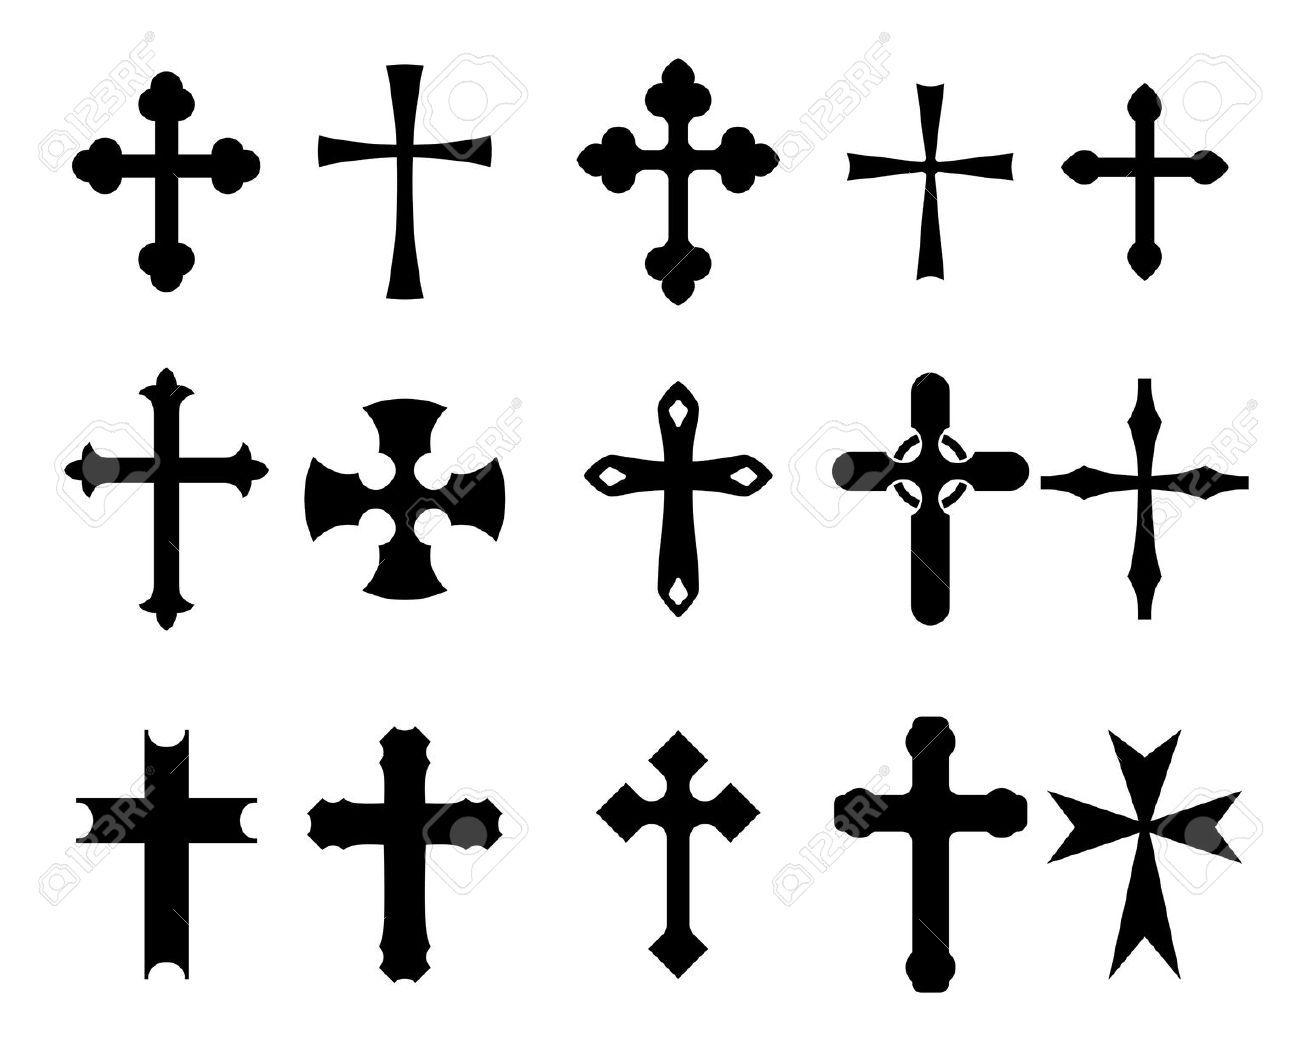 Christian symbol tattoos choice image symbol and sign ideas 11082385 set of religious cross symbols isolated on white cross 11082385 set of religious cross symbols biocorpaavc Images